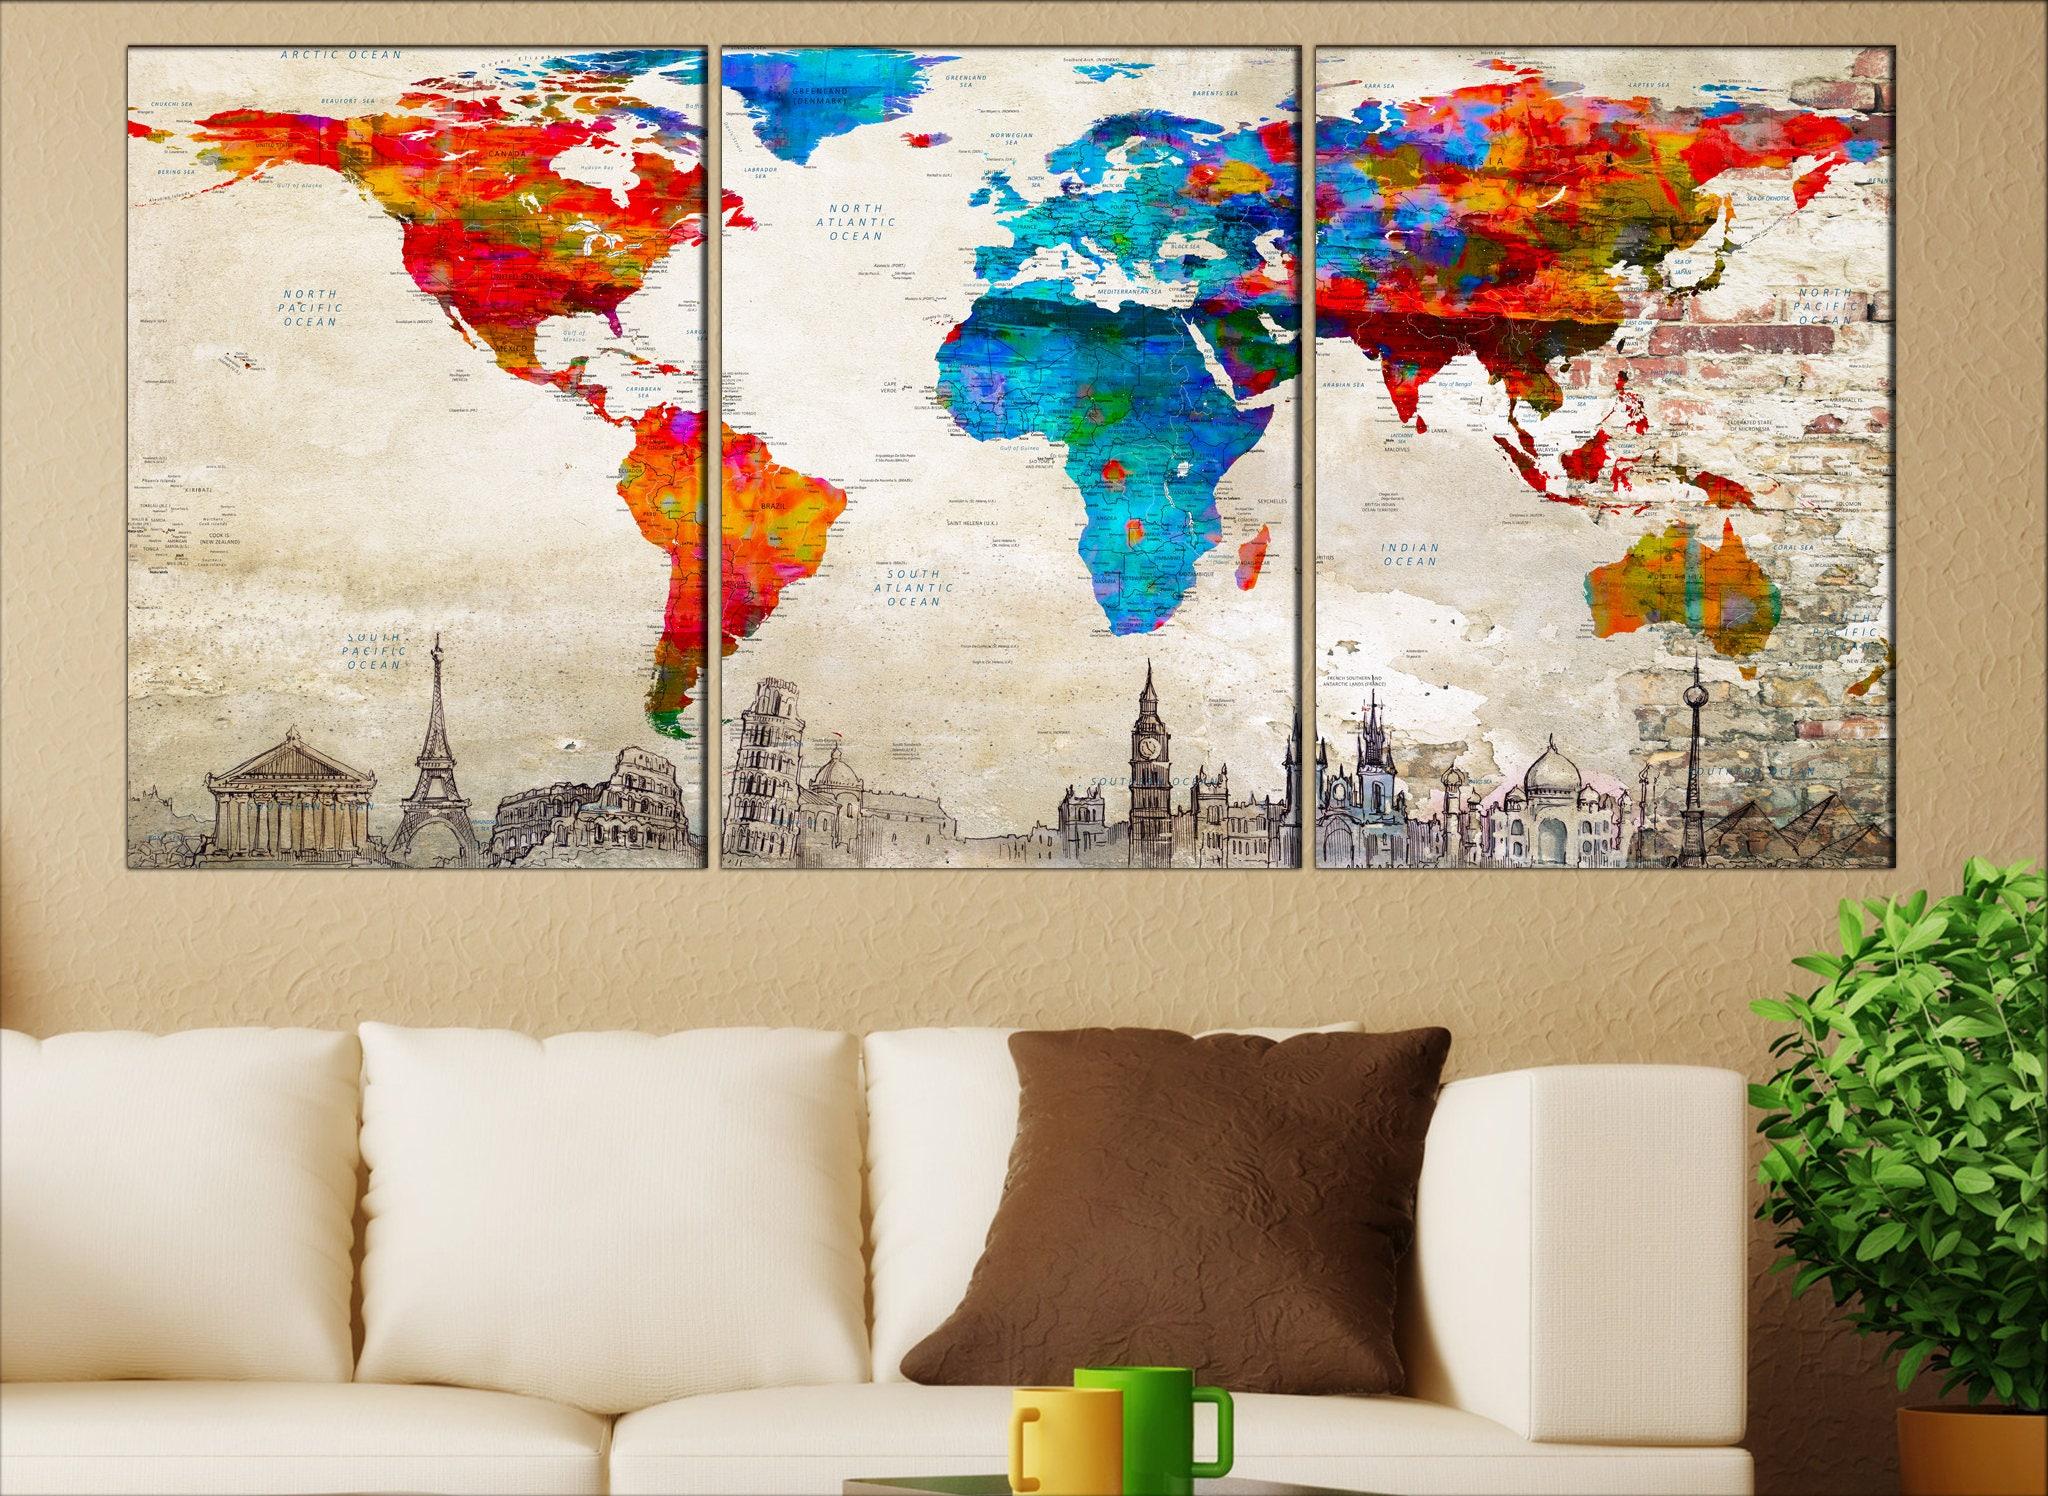 monde carte toile toile murale art monde toile push pin carte etsy. Black Bedroom Furniture Sets. Home Design Ideas